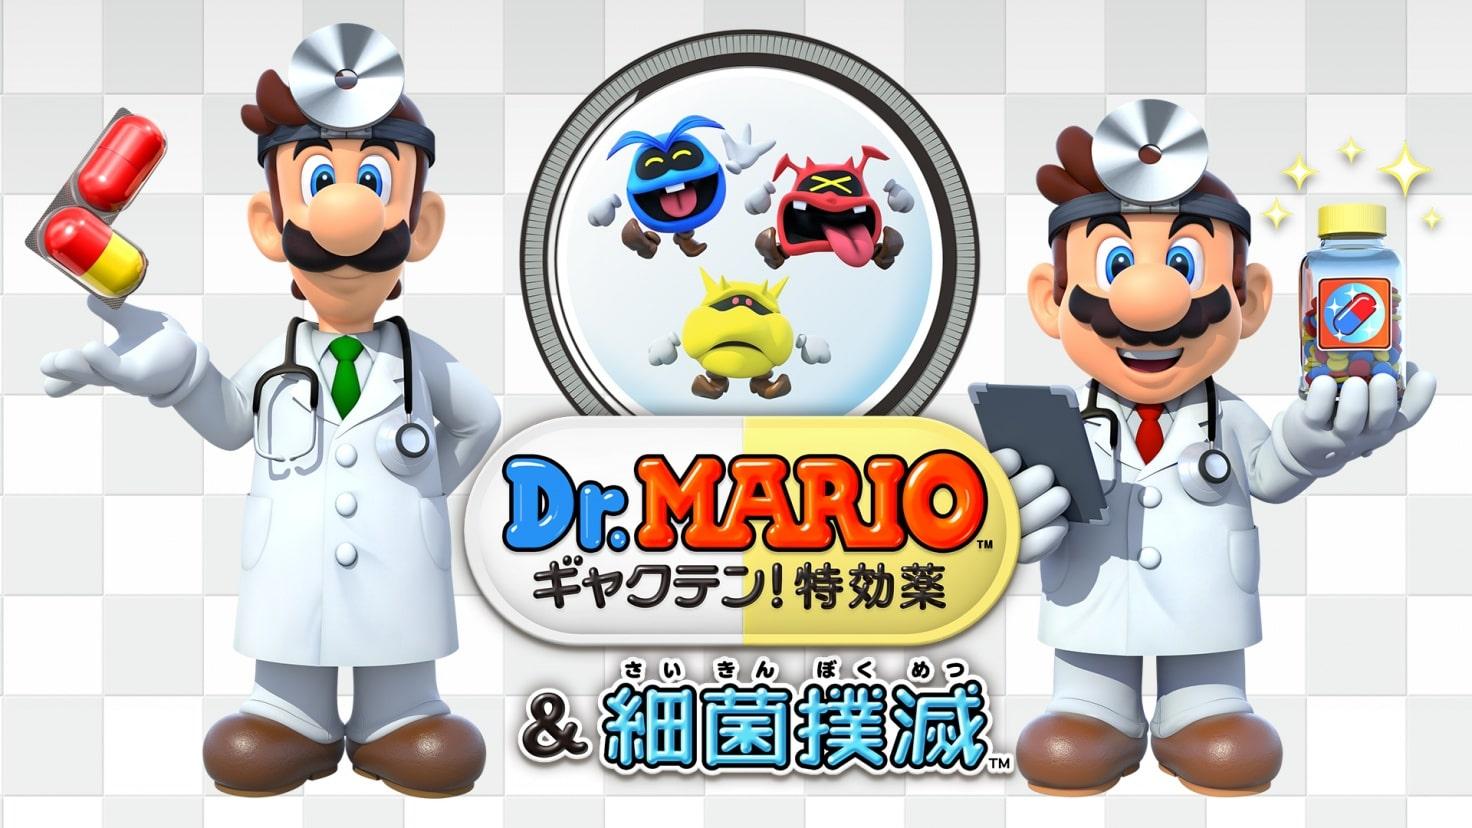 Dr.MARIO-ギャクテン特効薬-細菌撲滅